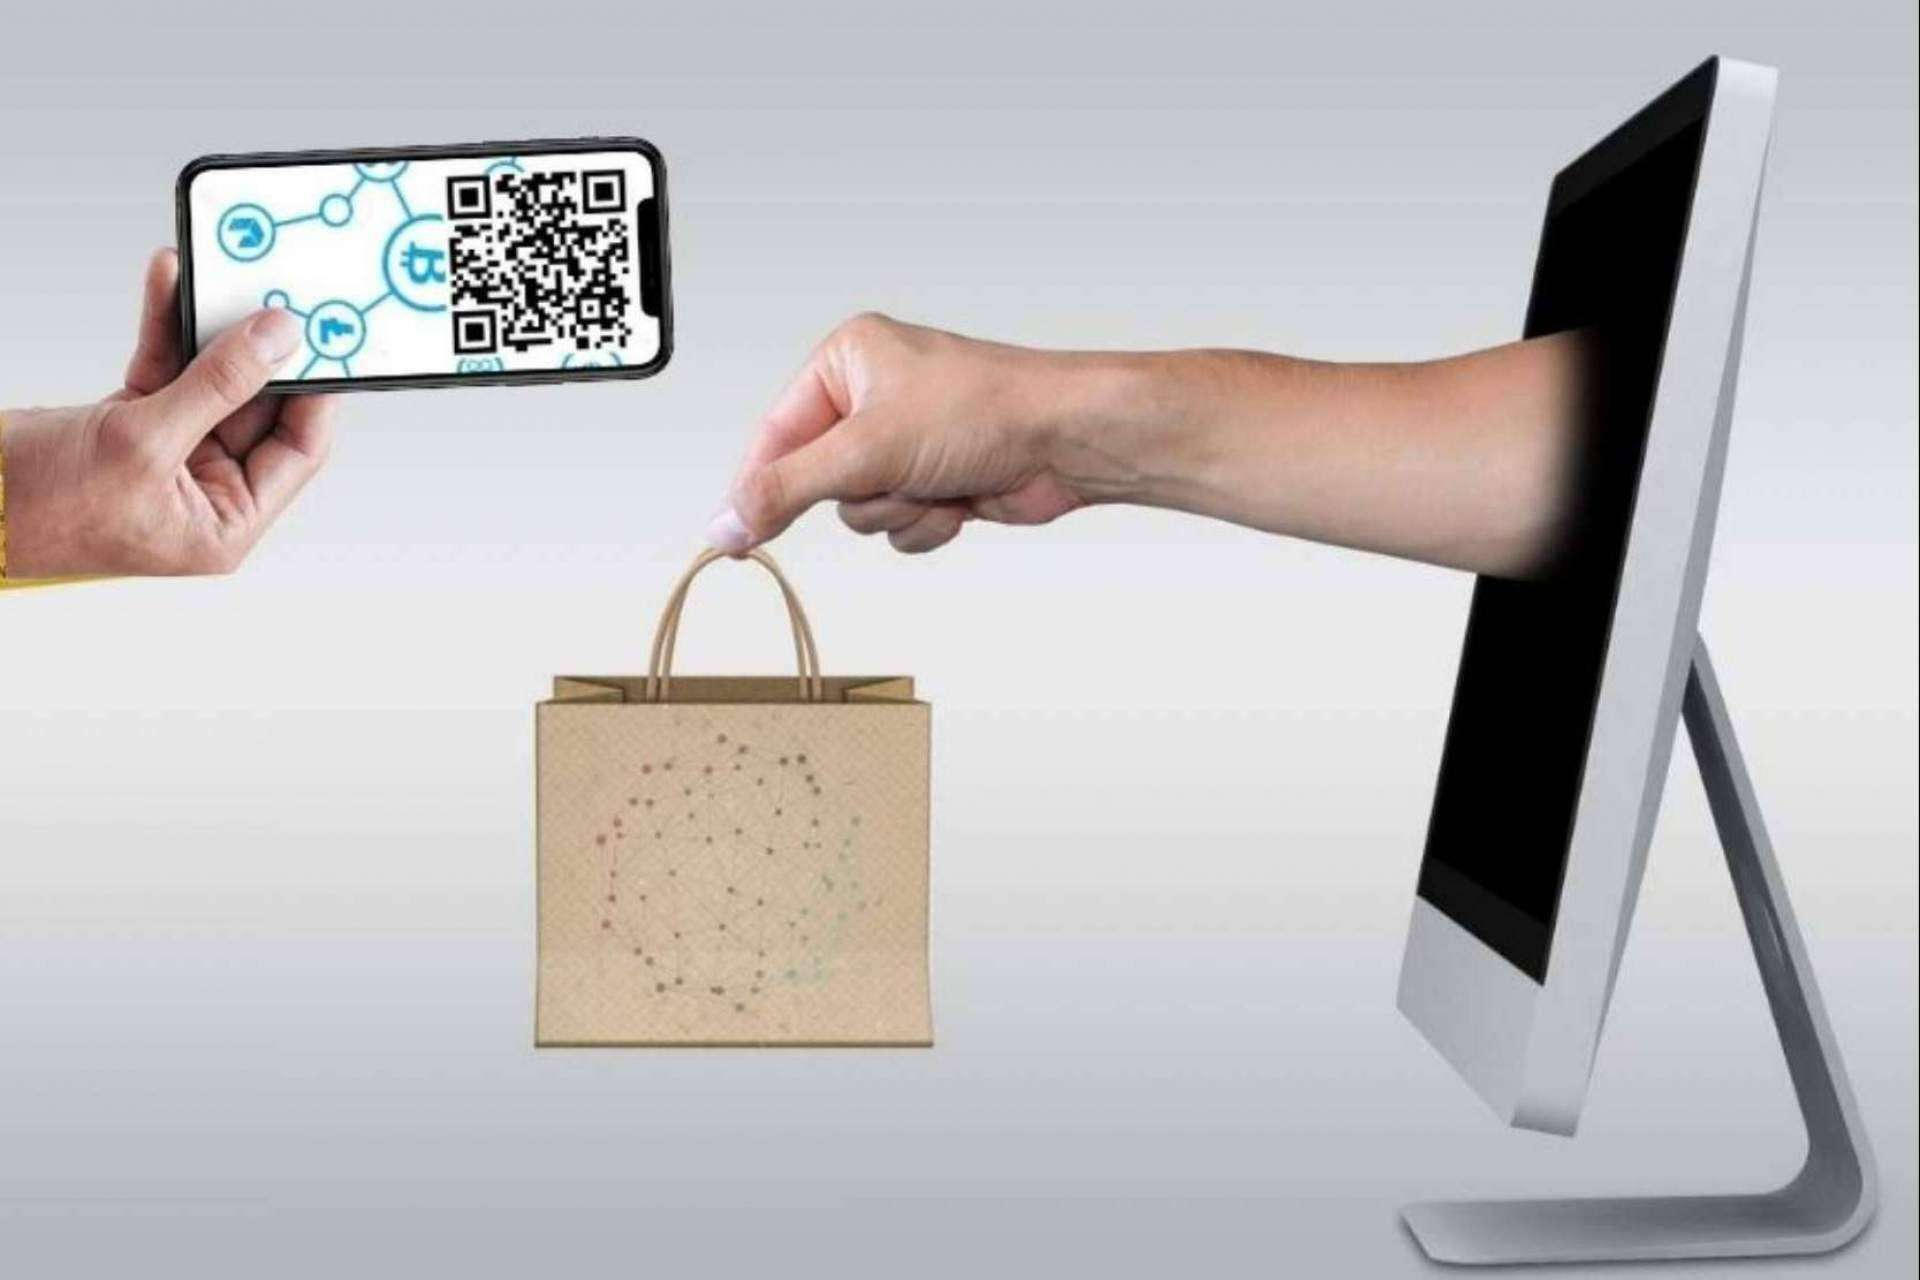 Satoshi Shopping Center es el marketplace de pago exclusivamente en criptomonedas